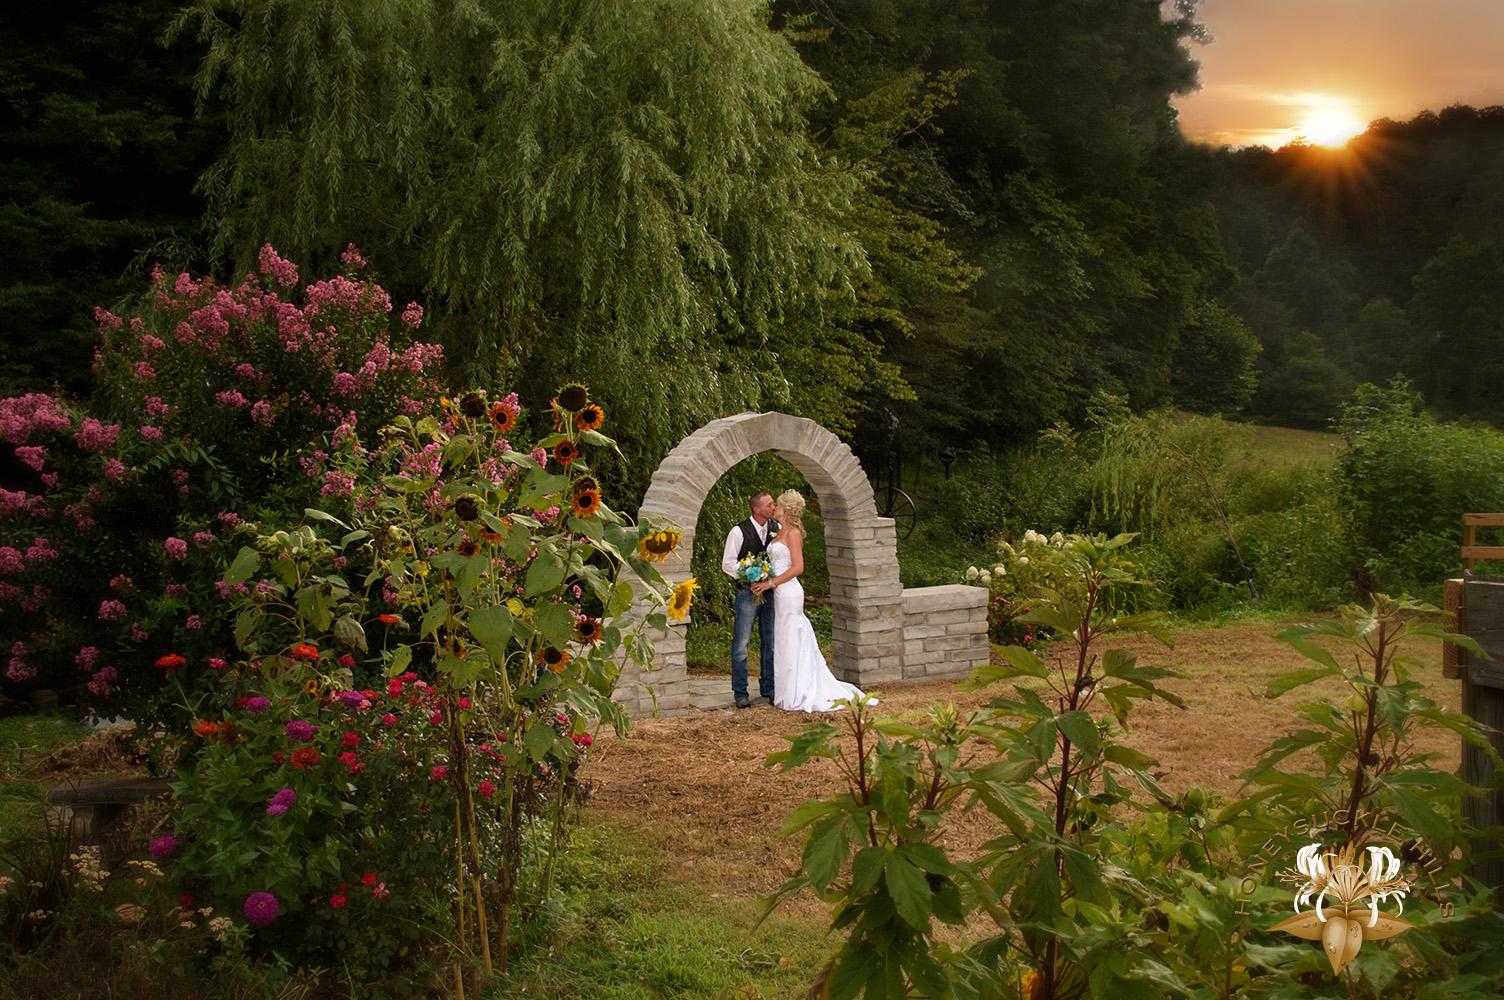 Gatlinburg Wedding Packages.Gatlinburg Wedding Packages For Two Deijmuidennaar